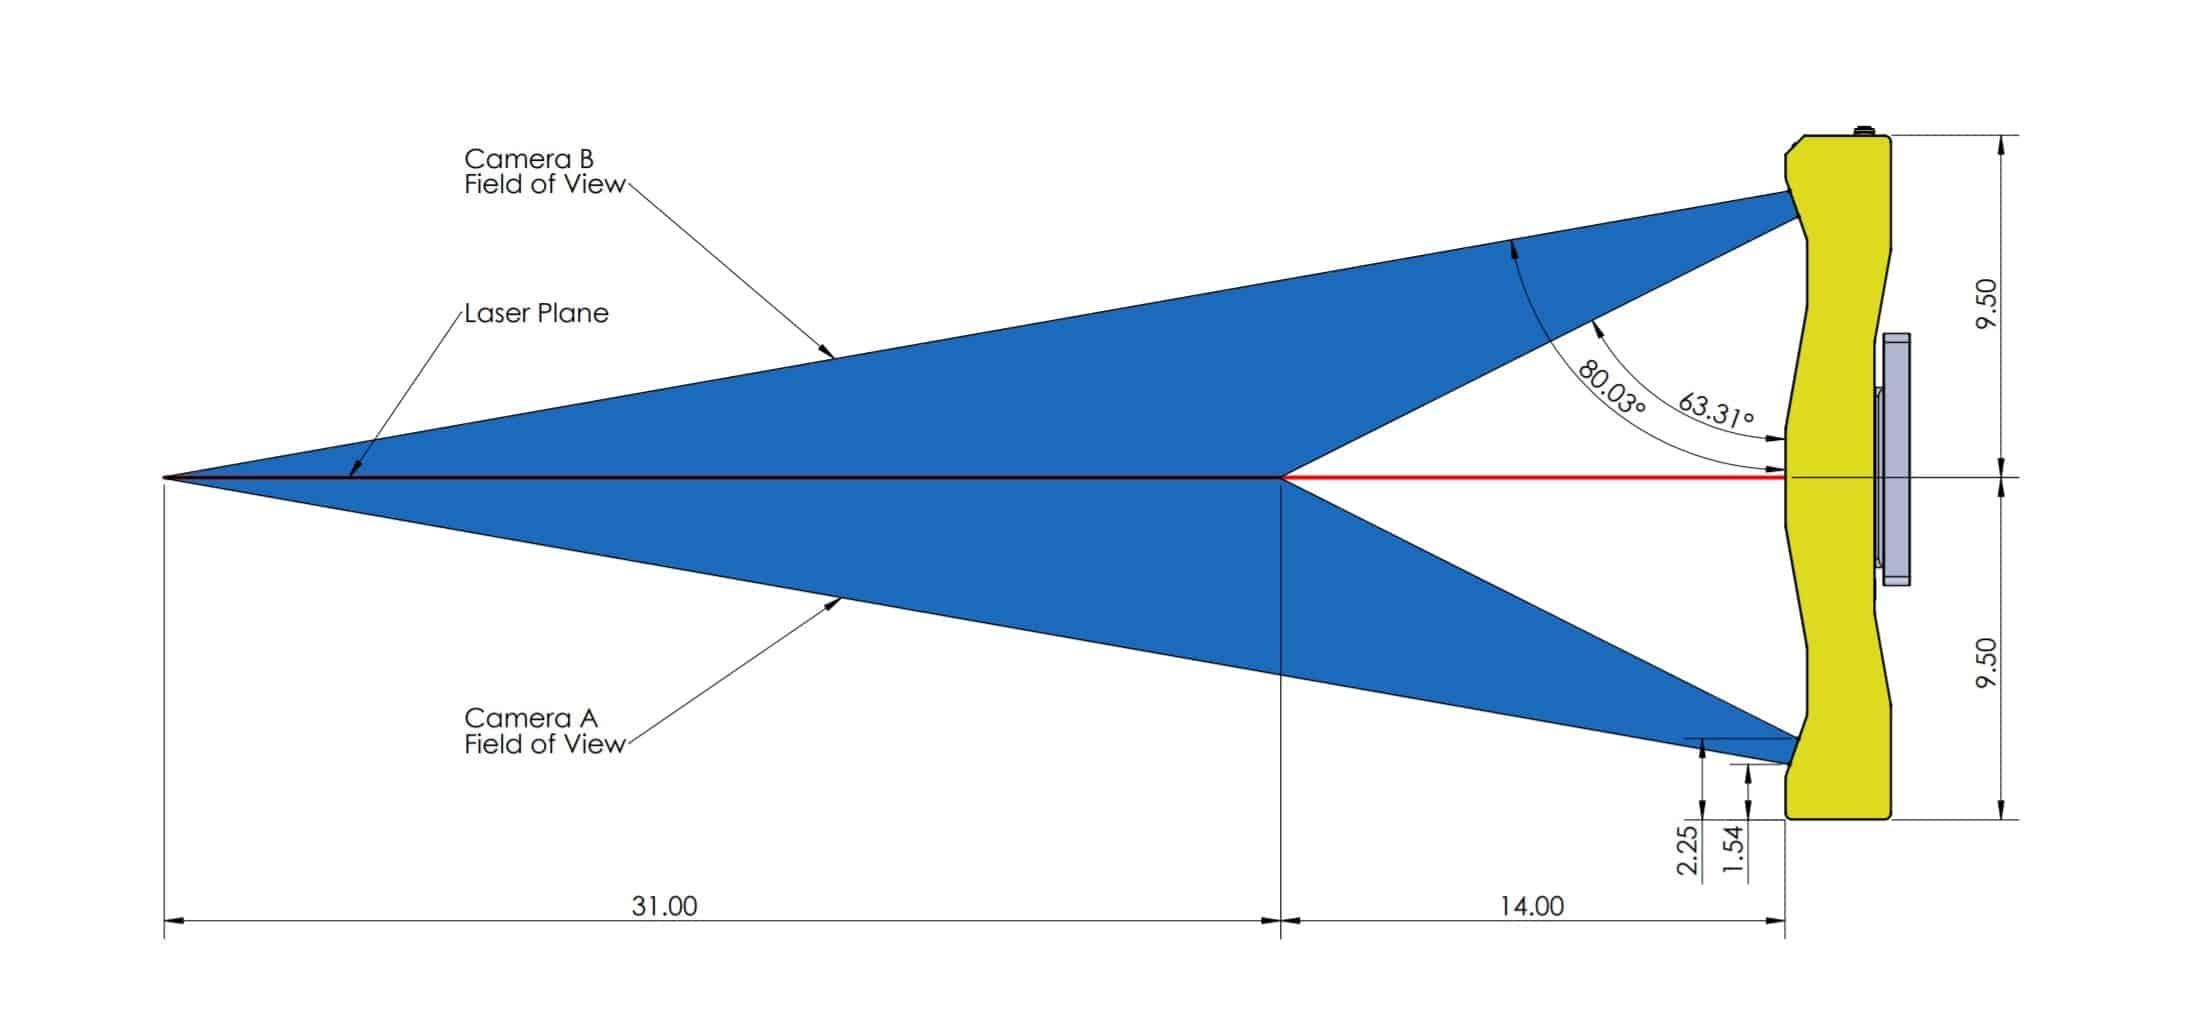 JS-50 WX FoV profile